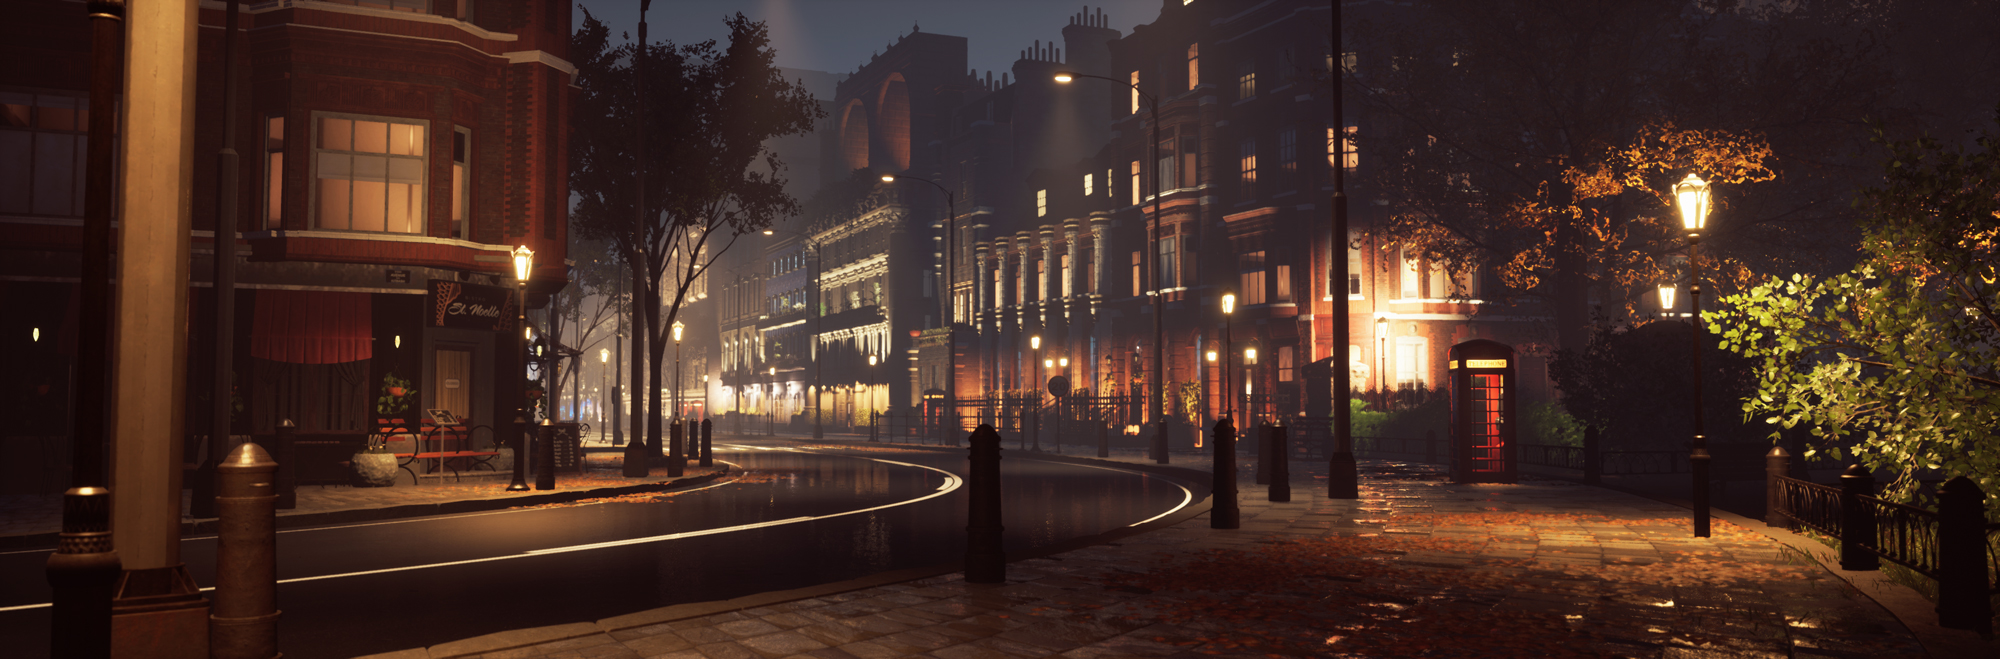 Londoner Night 3